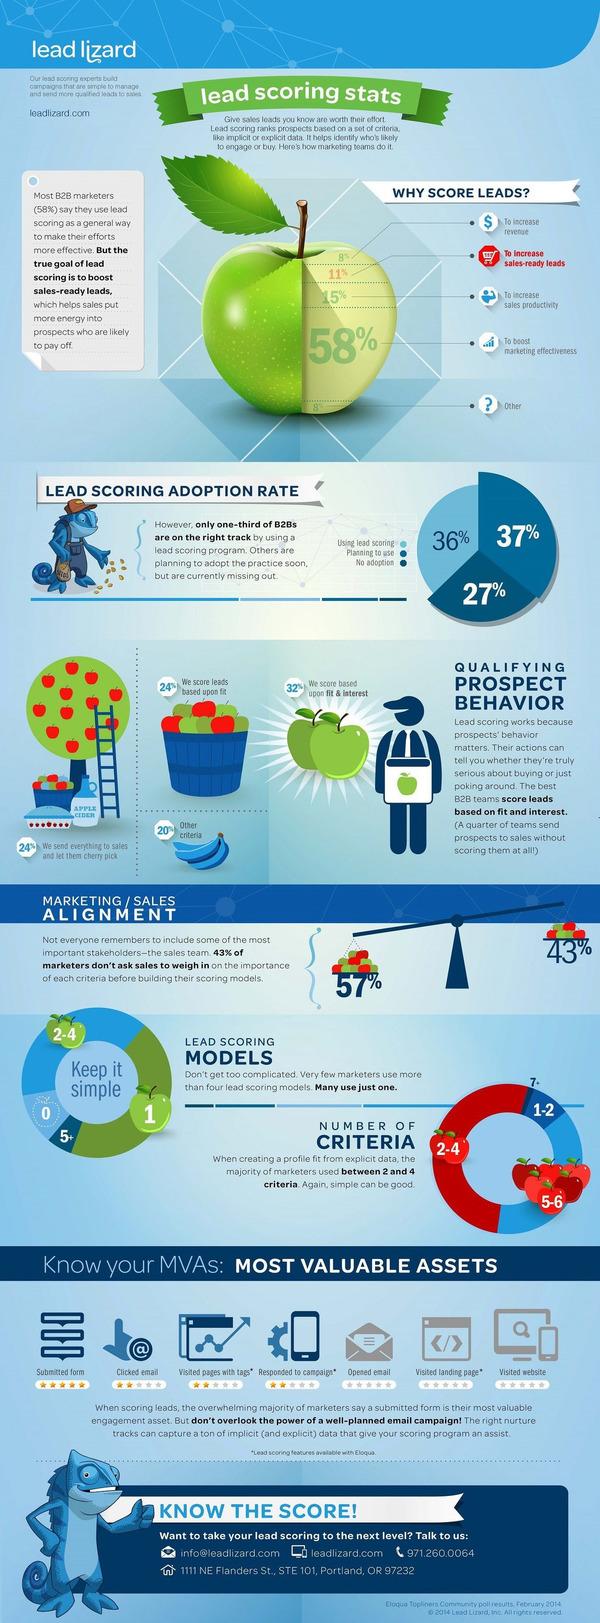 B2B Lead scoring infographic - Smart Insights | The Marketing Technology Alert | Scoop.it